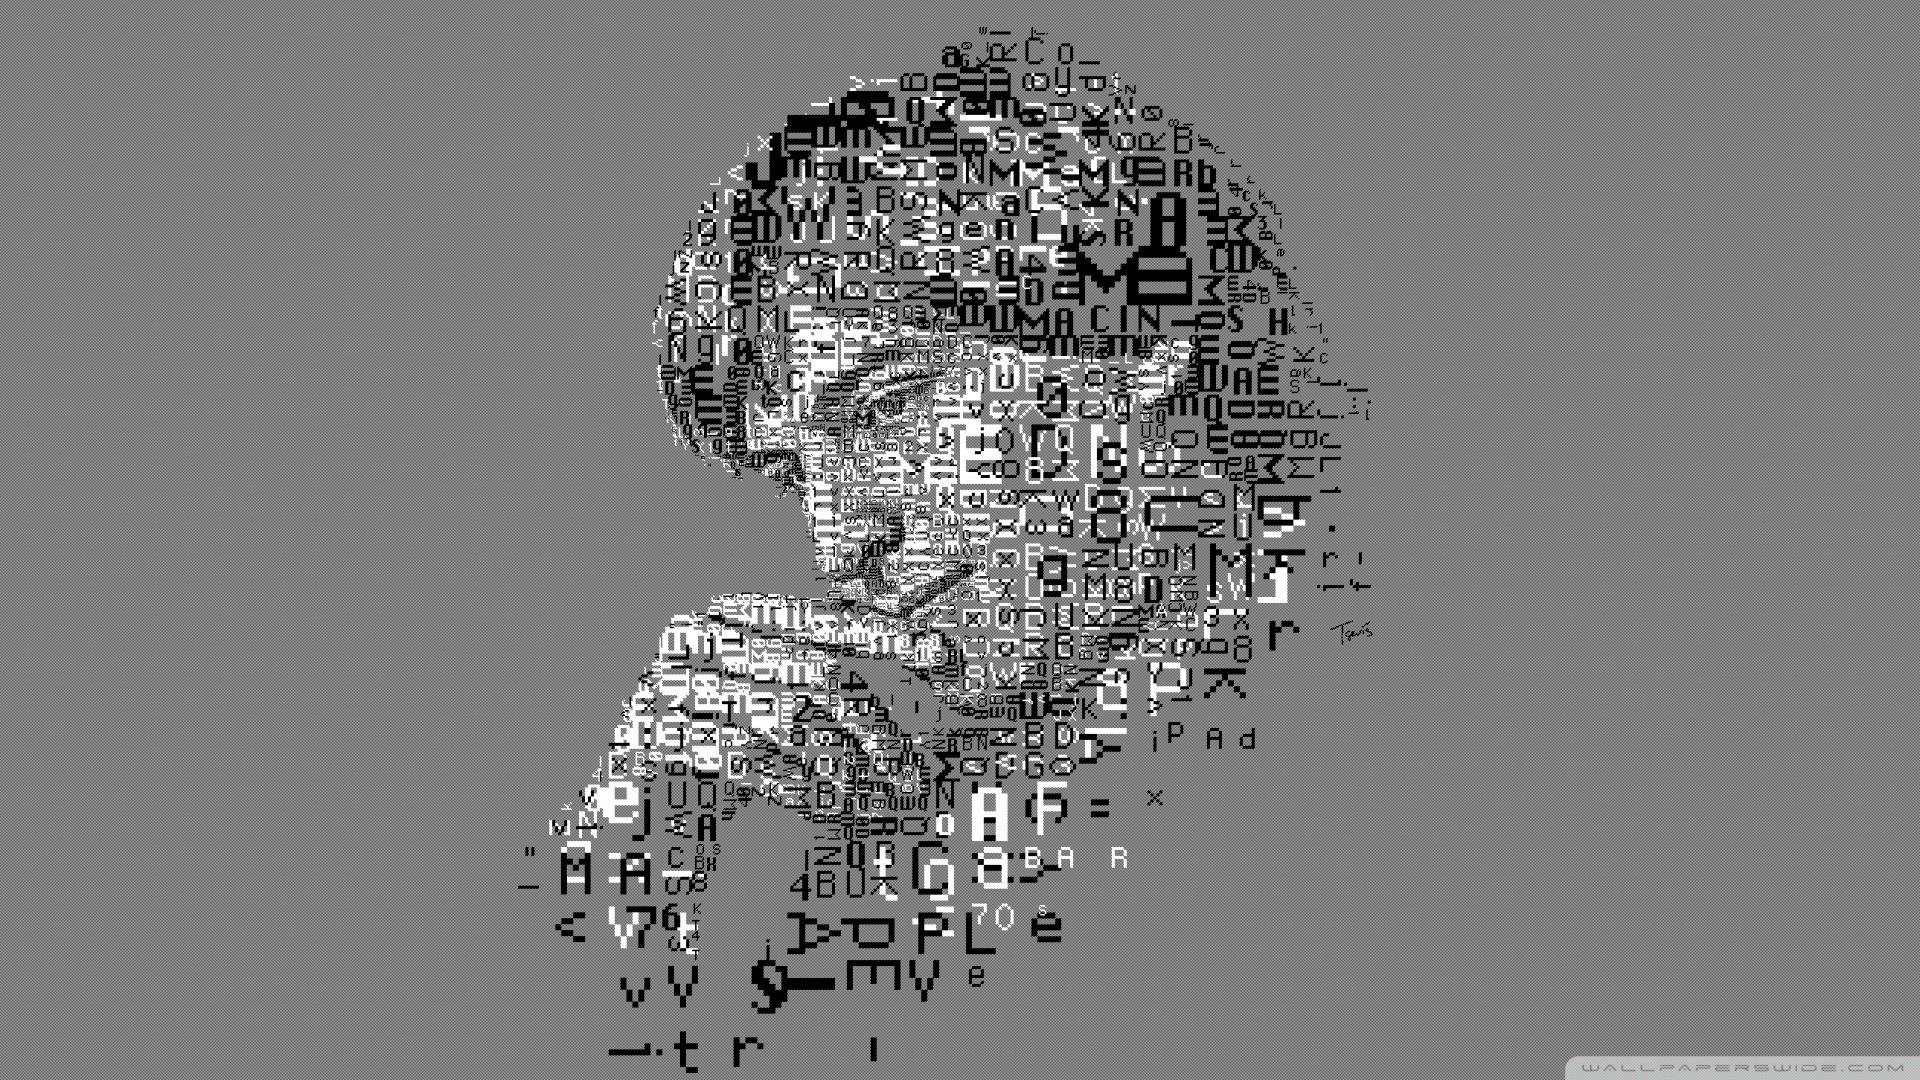 Hd - Steve Jobs Letras - HD Wallpaper